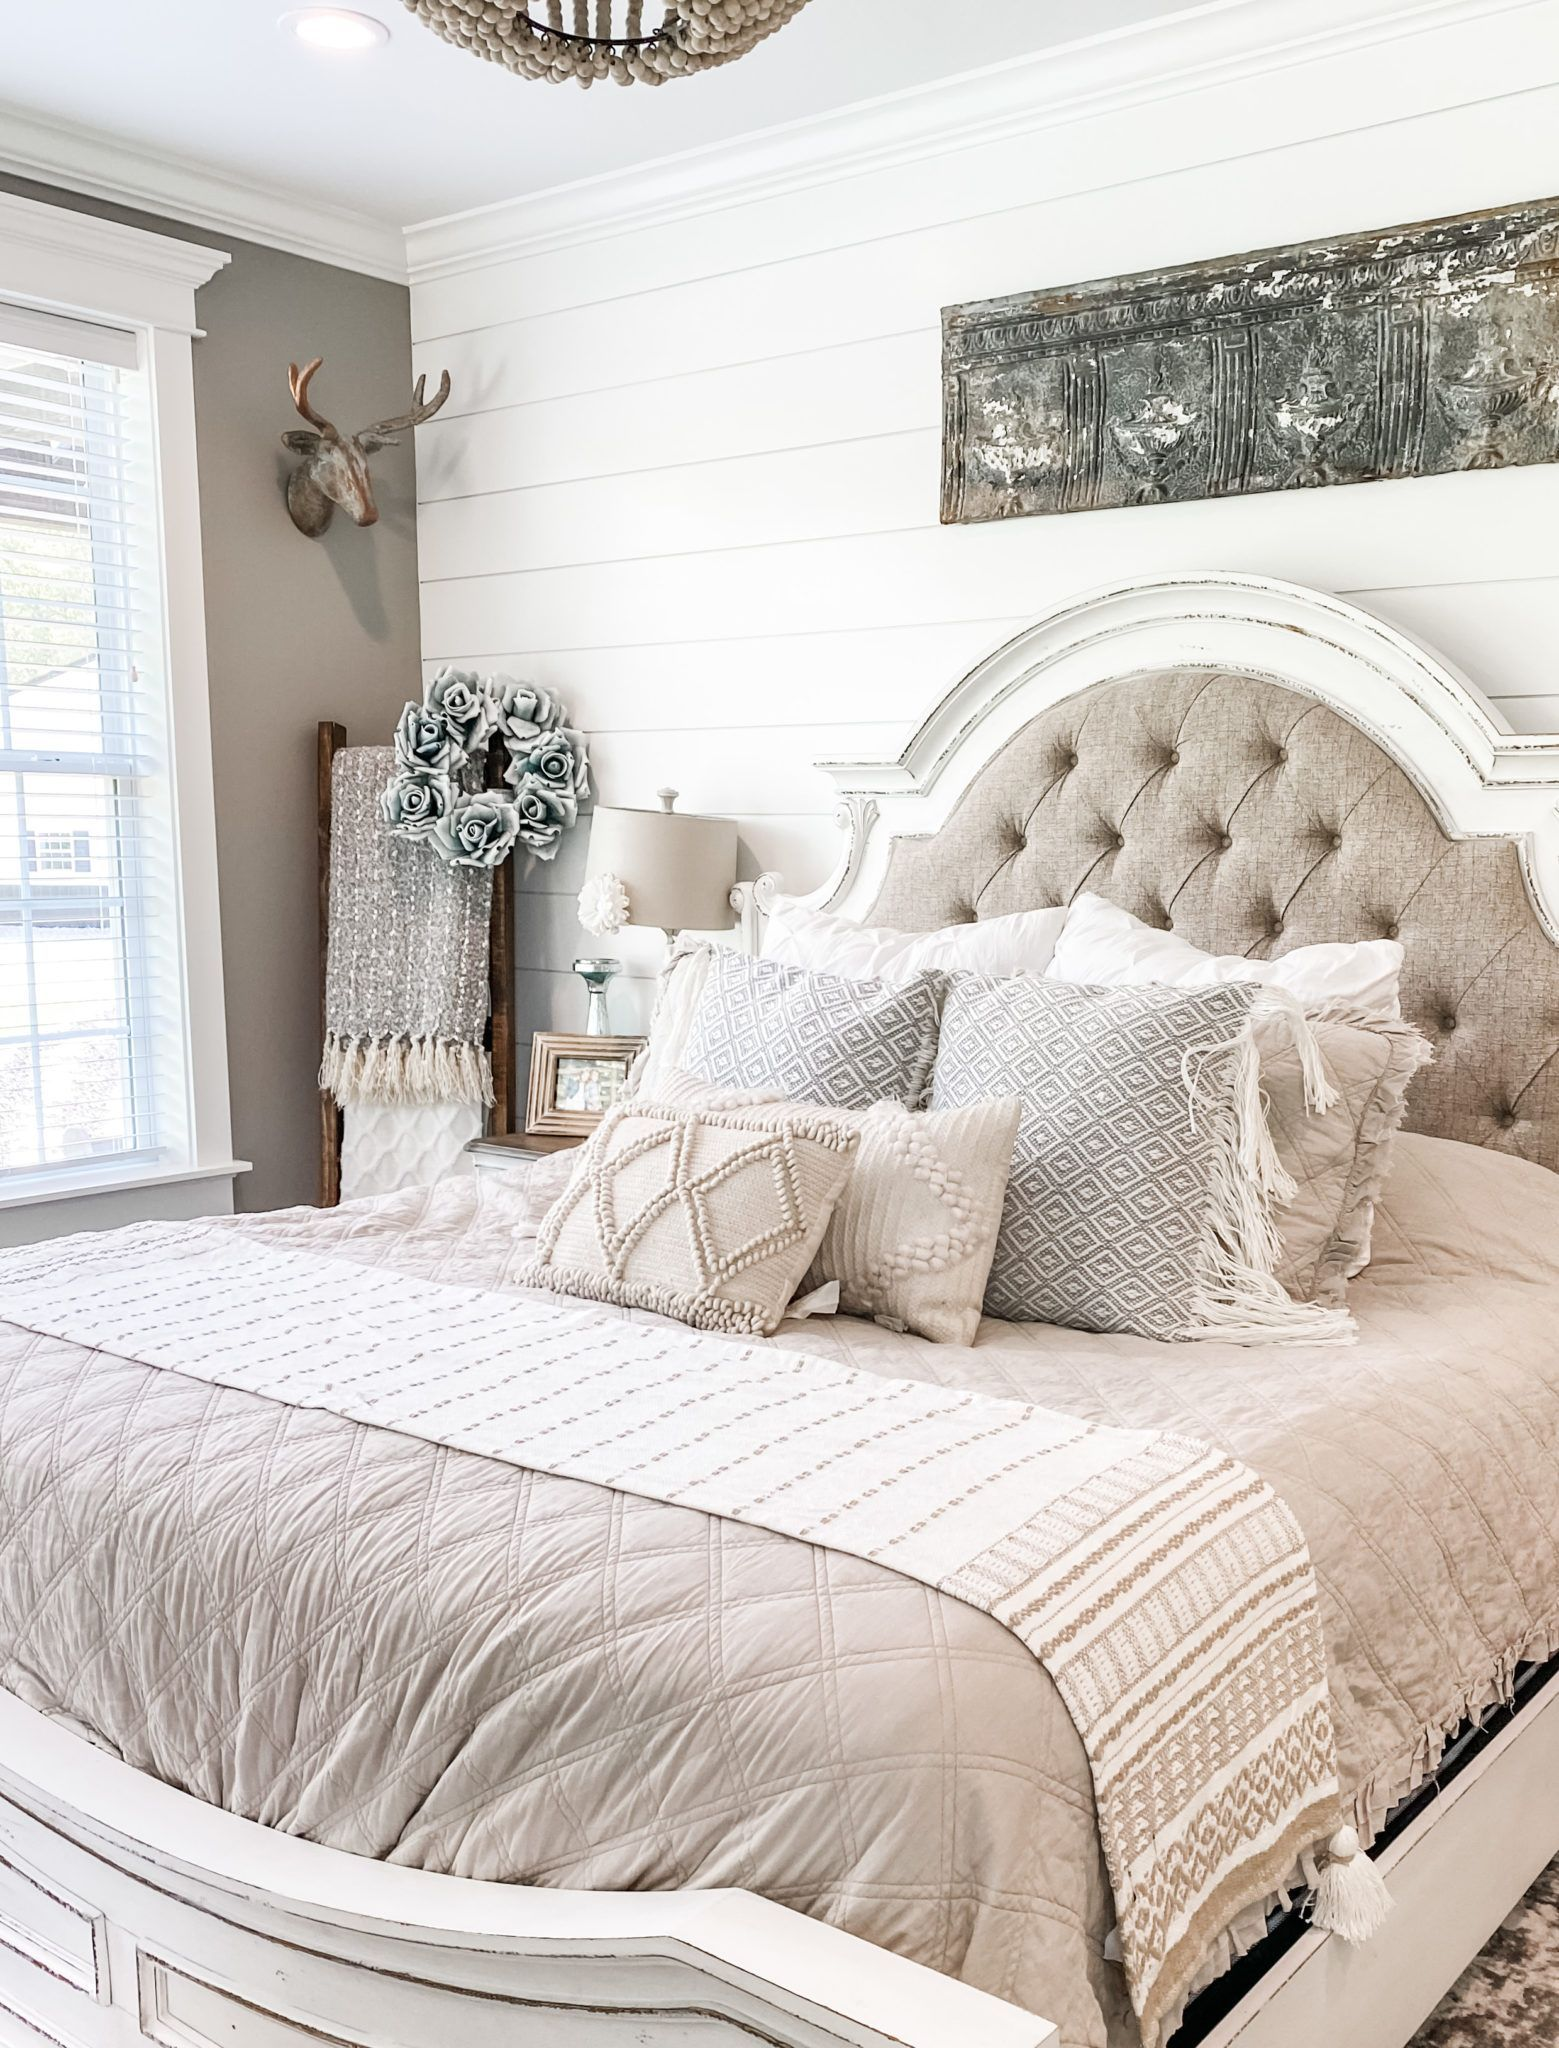 900 Bedrooms Ideas In 2021 Bedroom Decor Makeover